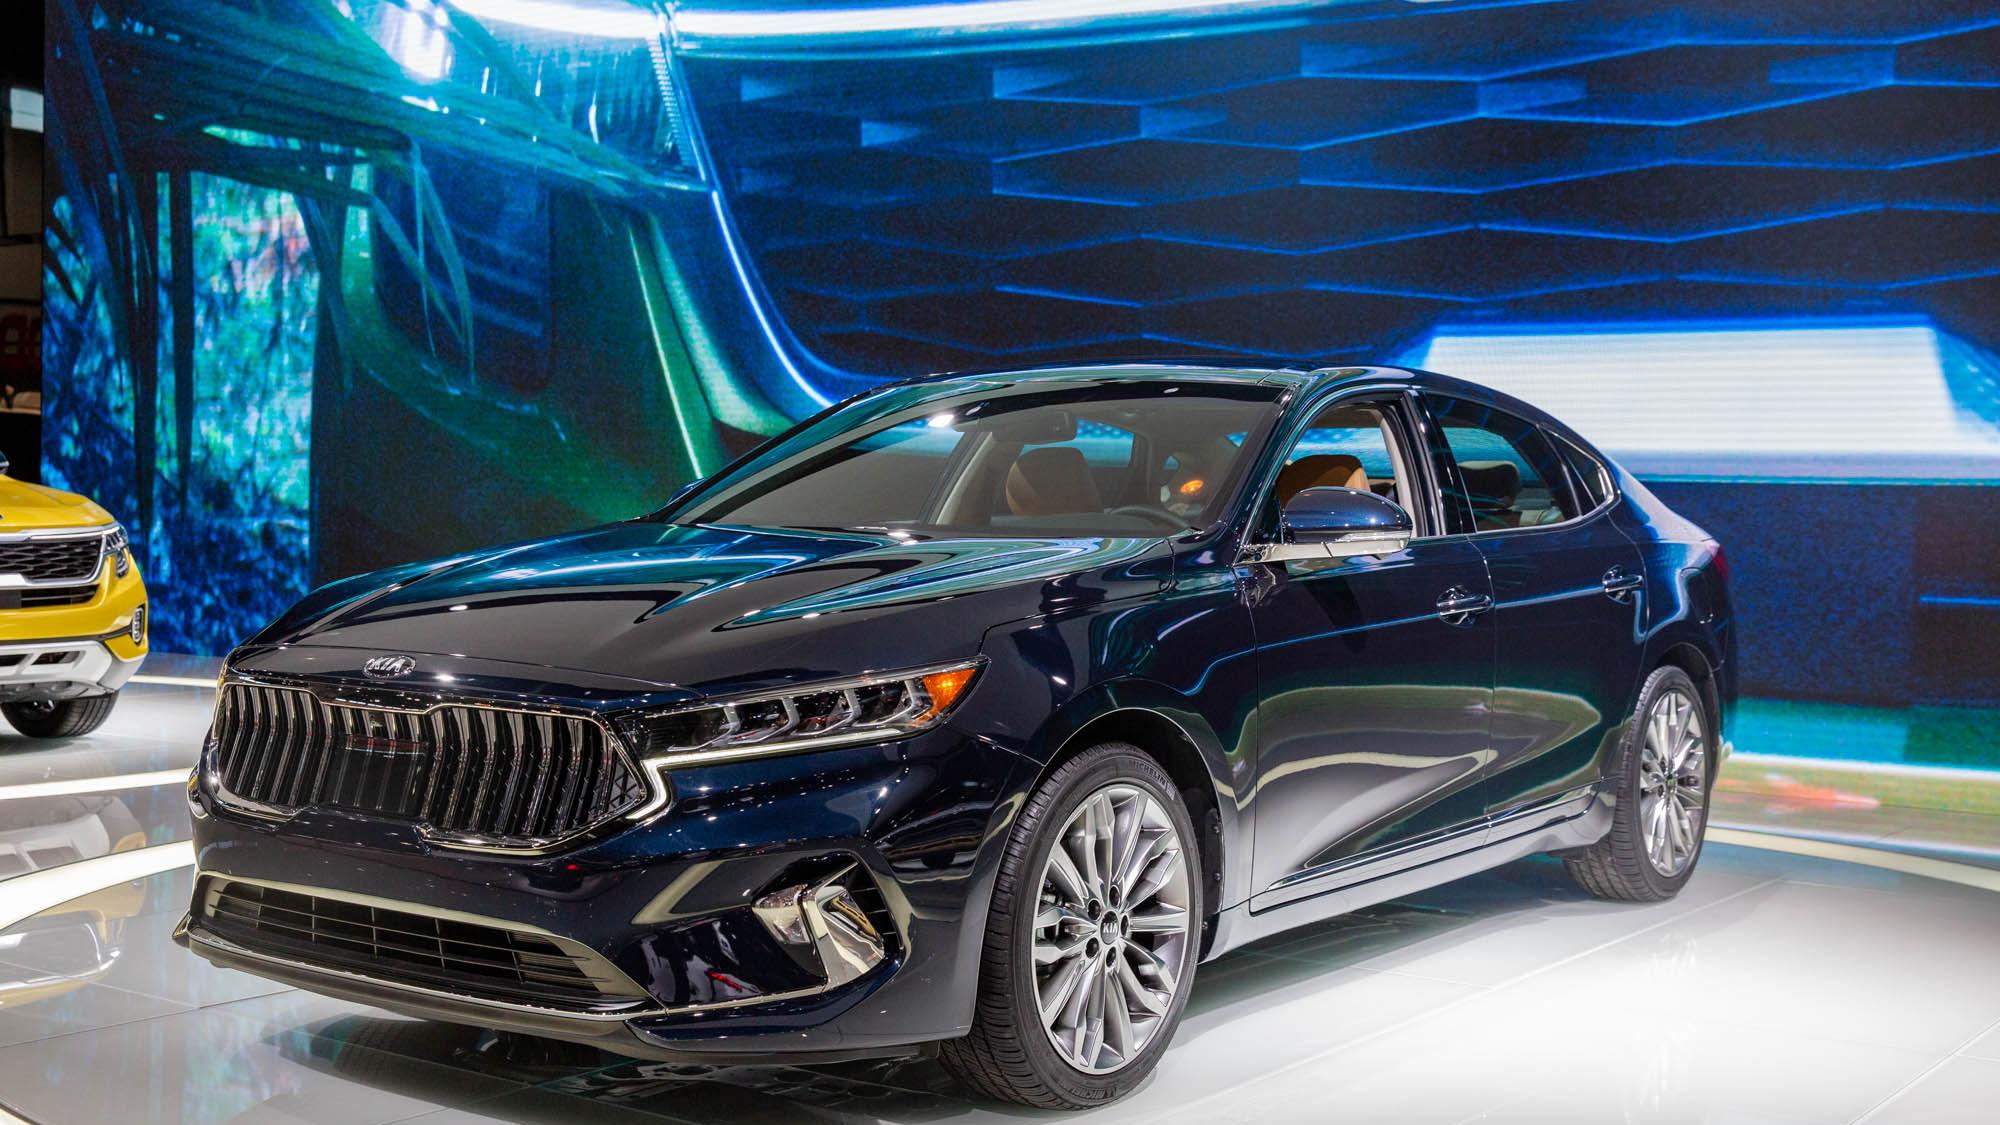 2020 Kia Cadenza, 2020 Chicago Auto Show